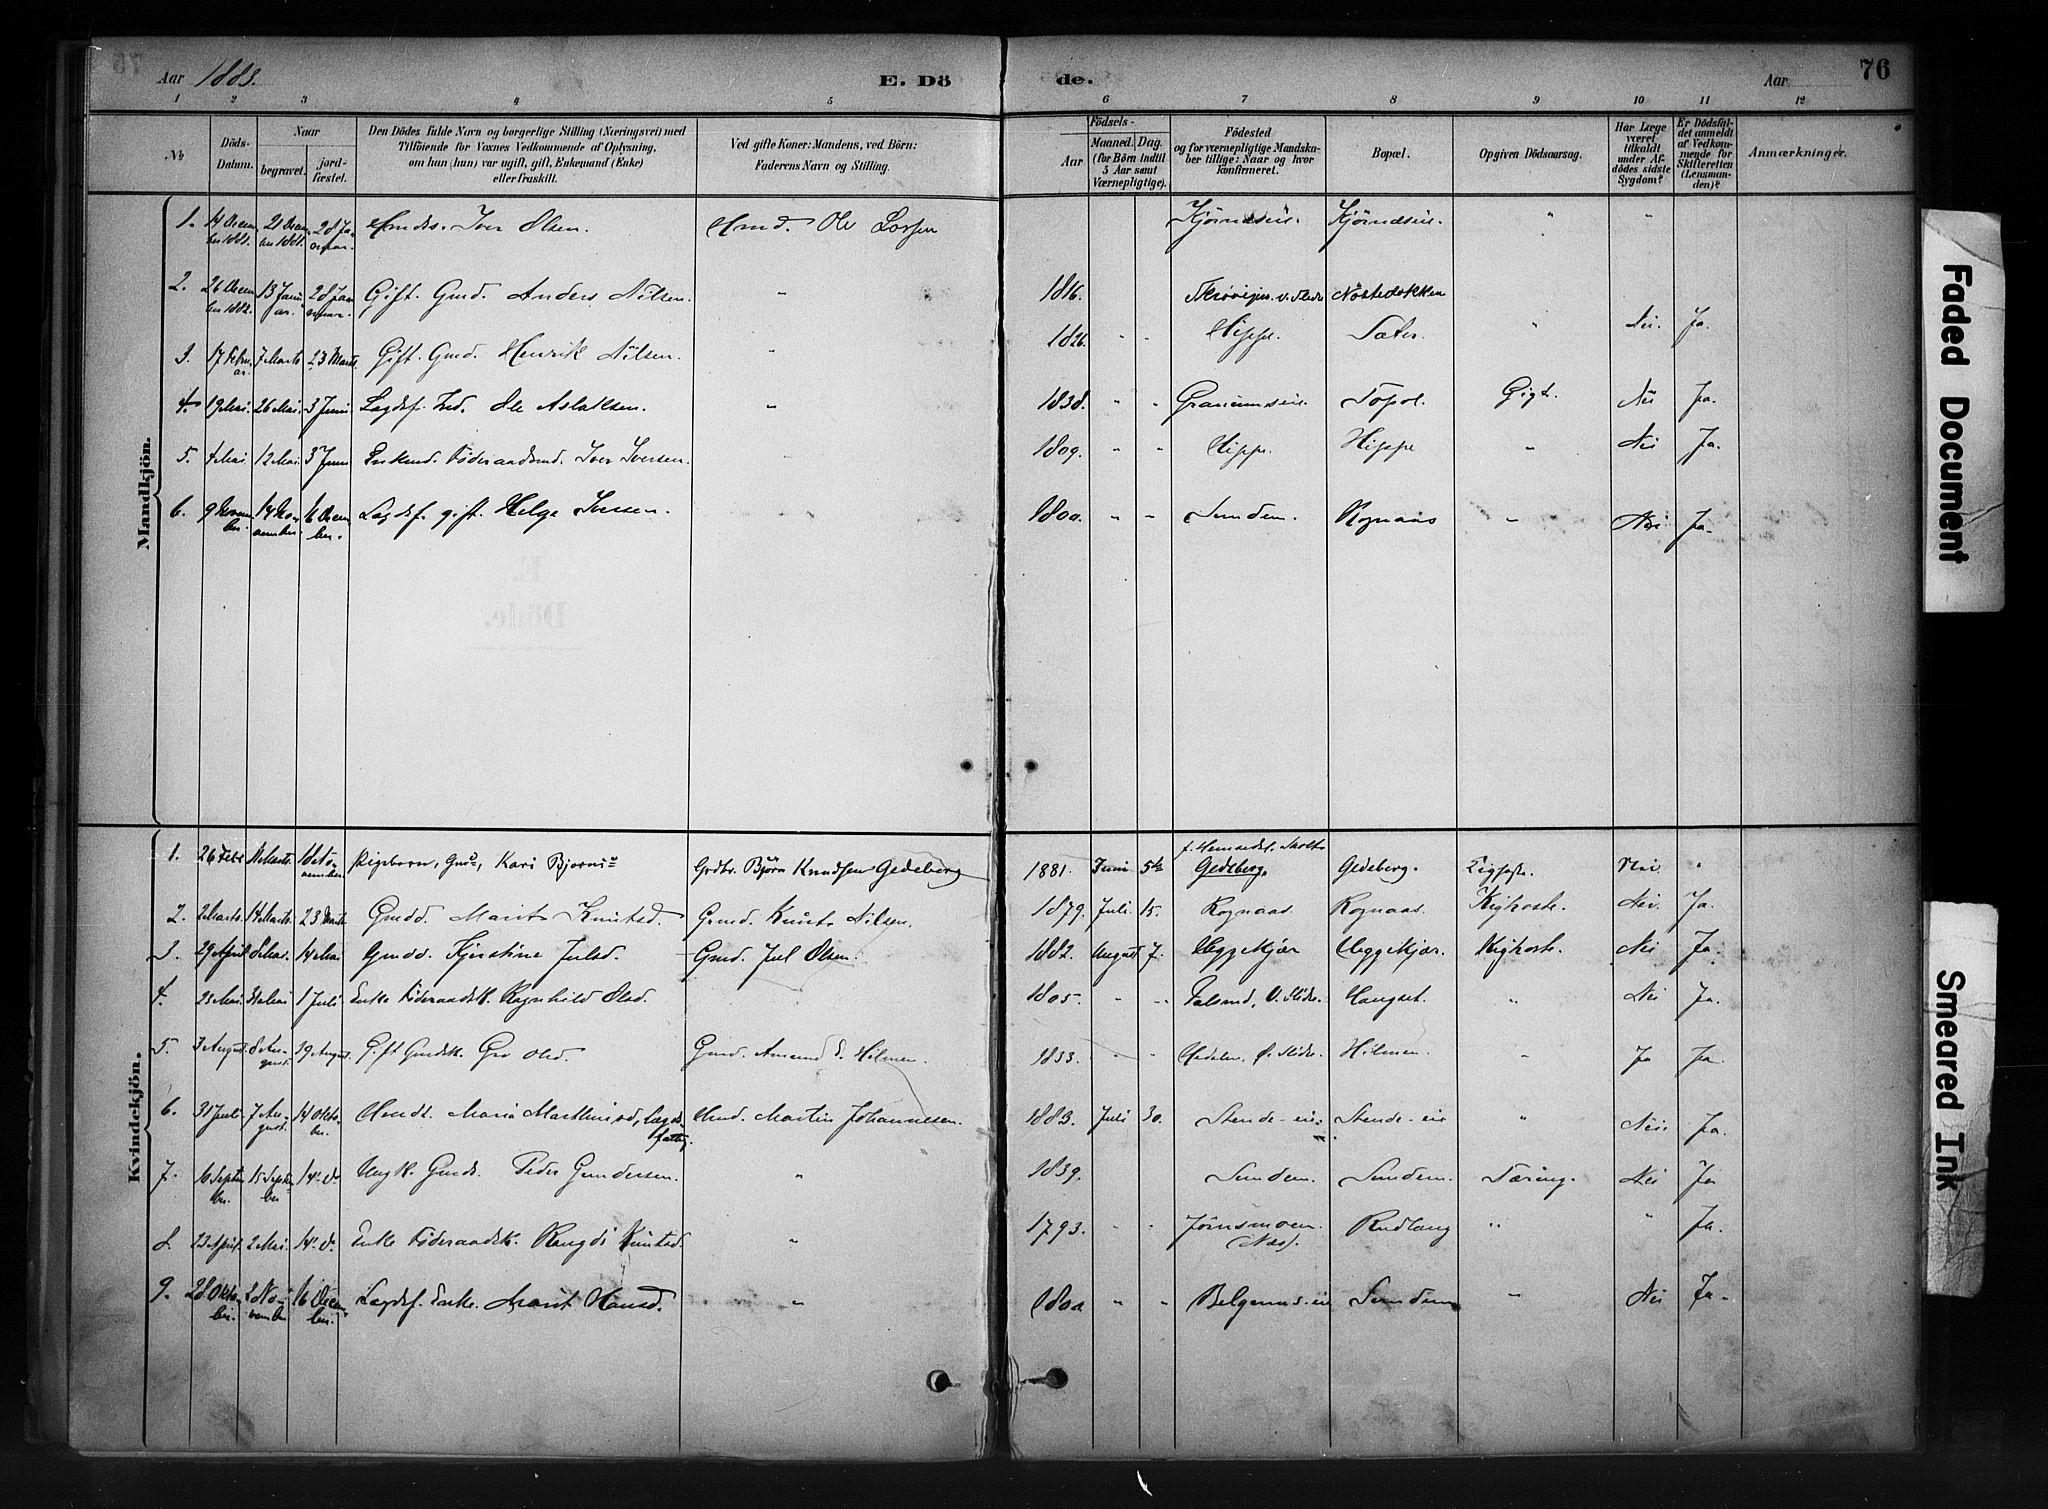 SAH, Nord-Aurdal prestekontor, Ministerialbok nr. 11, 1883-1896, s. 76